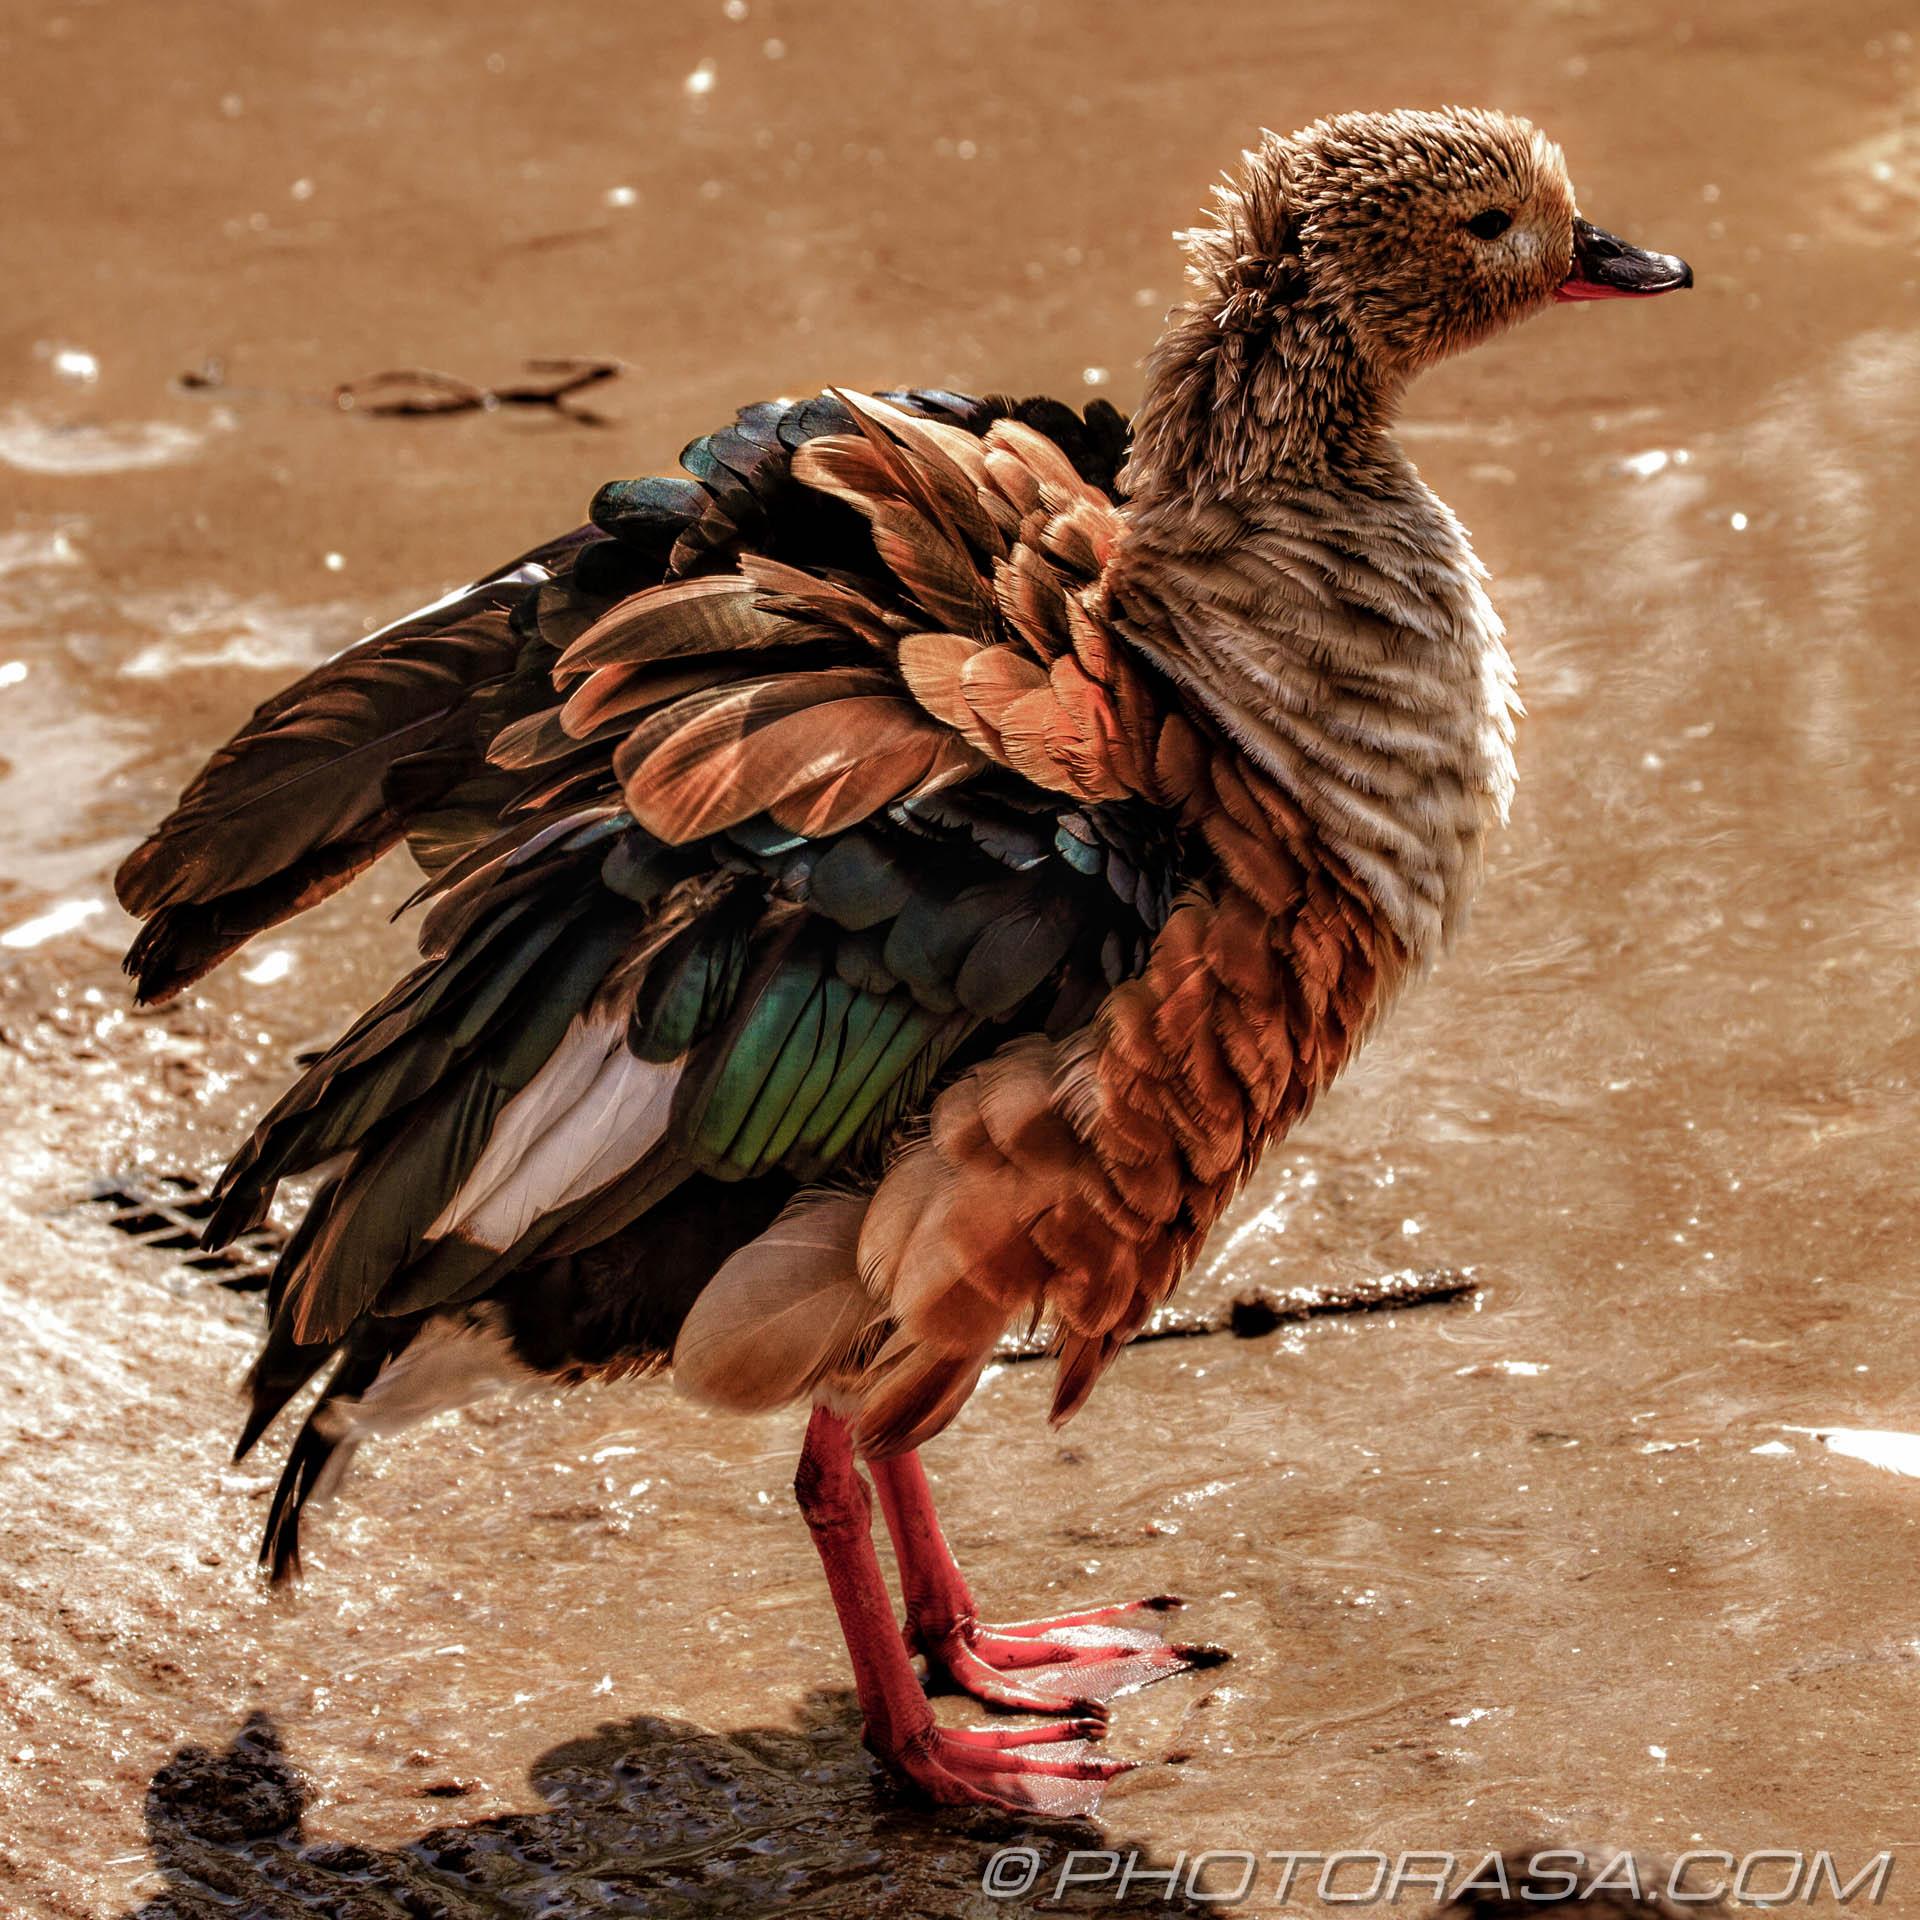 http://photorasa.com/birds-greenworld/orinoco-goose-ruffling-his-feathers/